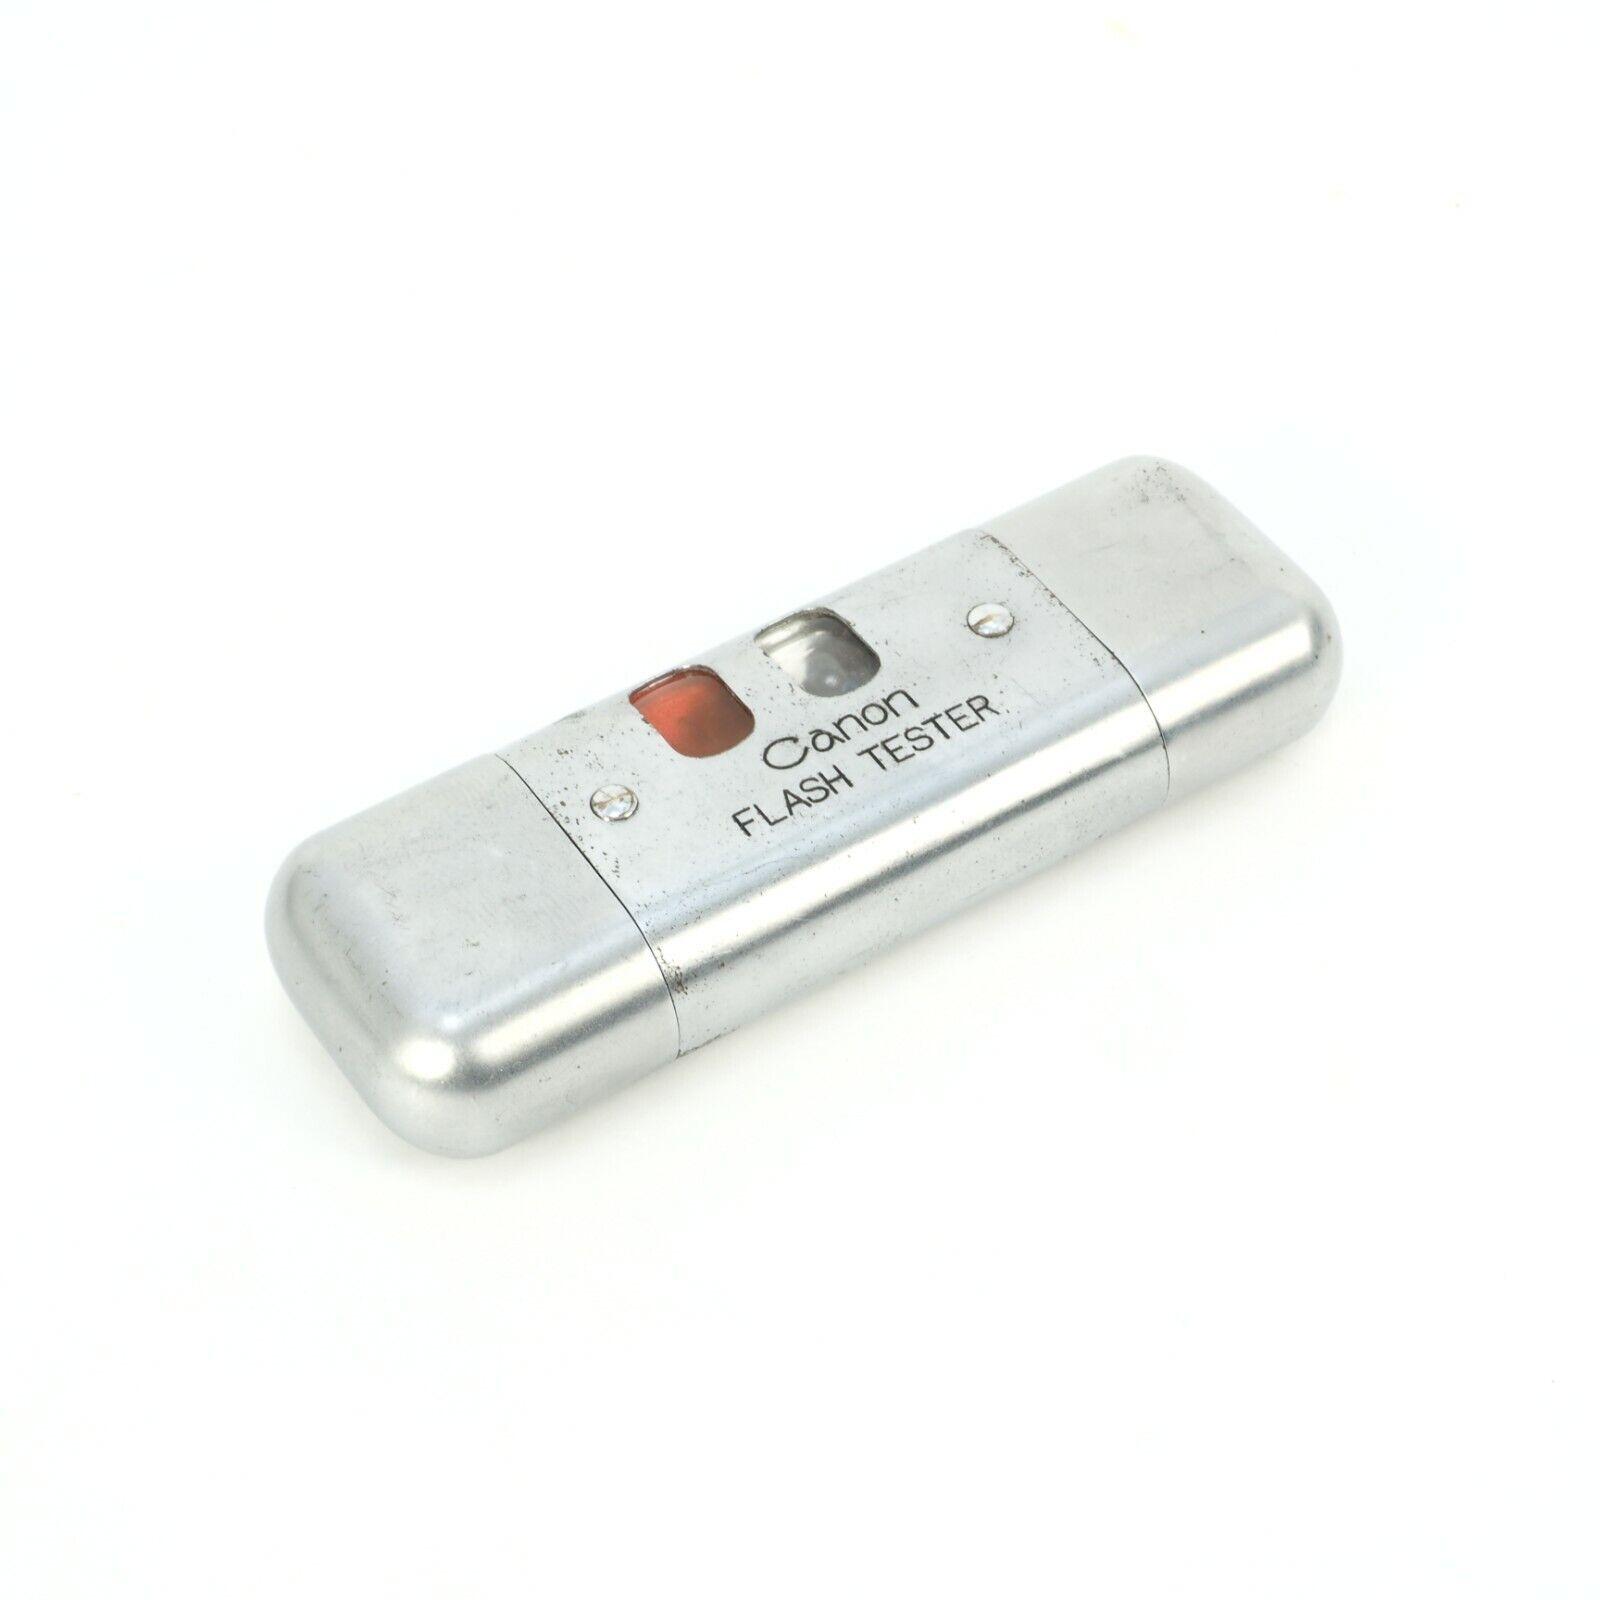 = Vintage Canon Camera Bulb Flash Unit Tester